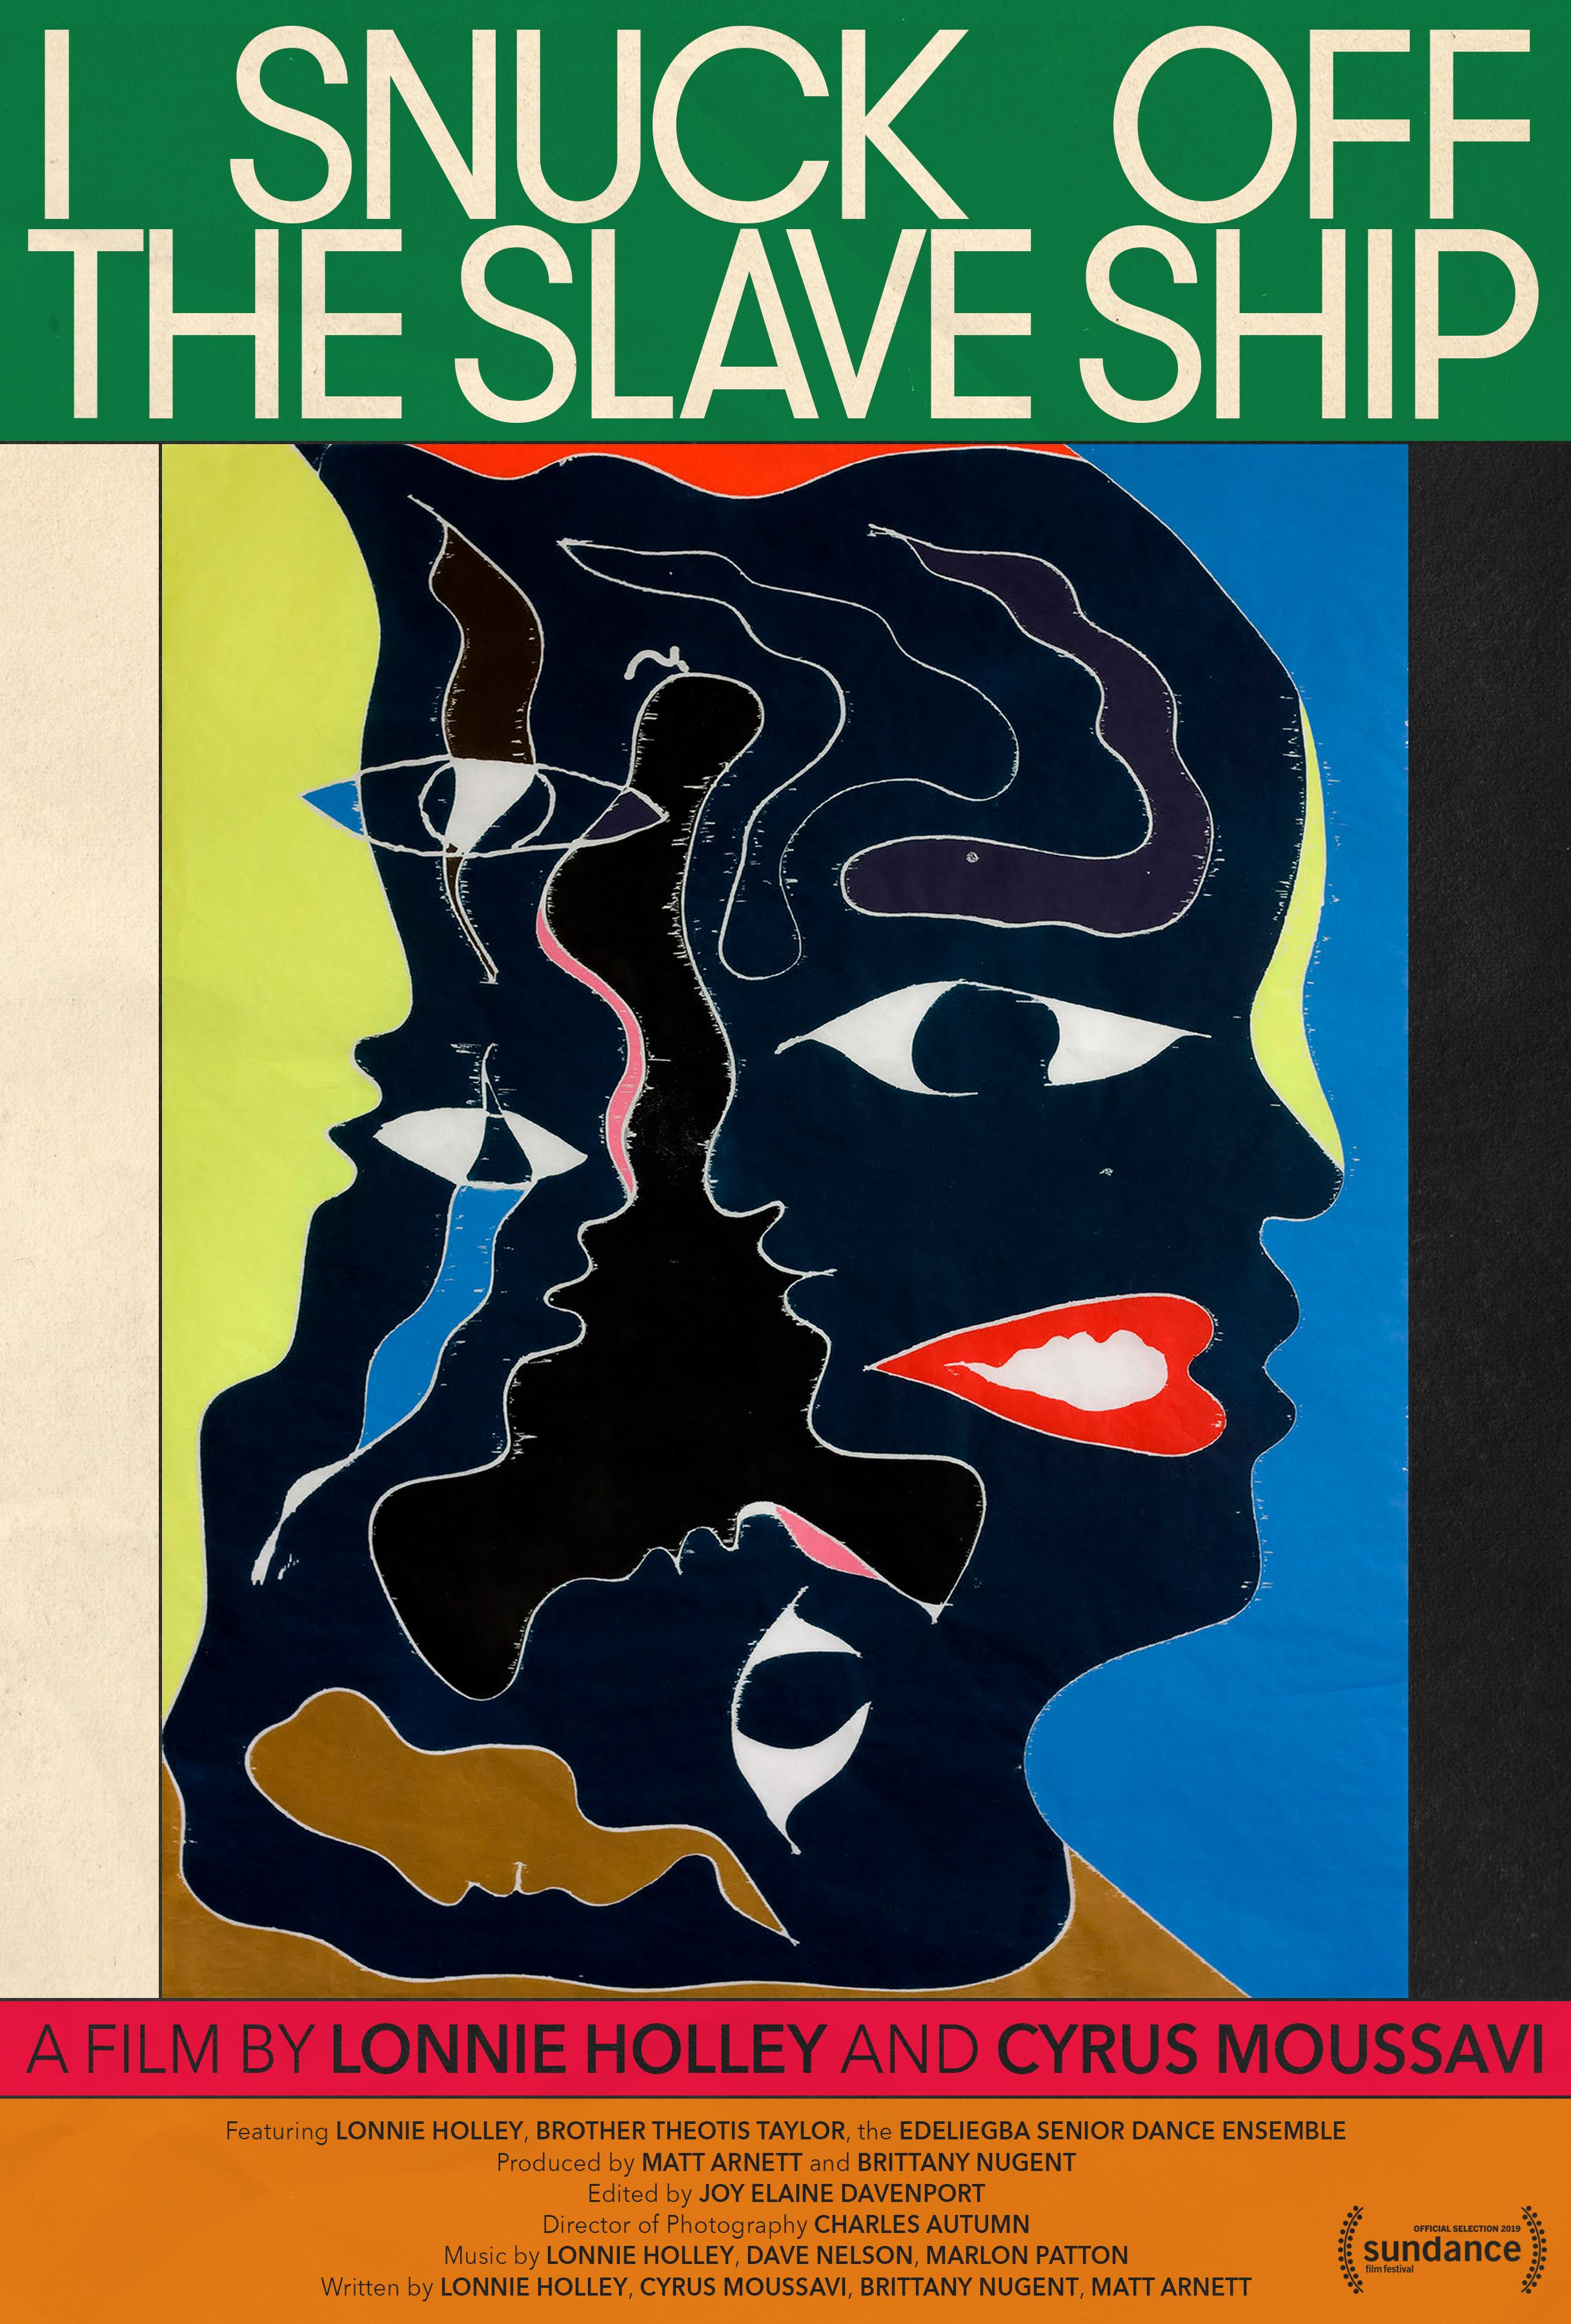 I Snuck Off the Slave Ship, Poster (2434 x 3600).jpg